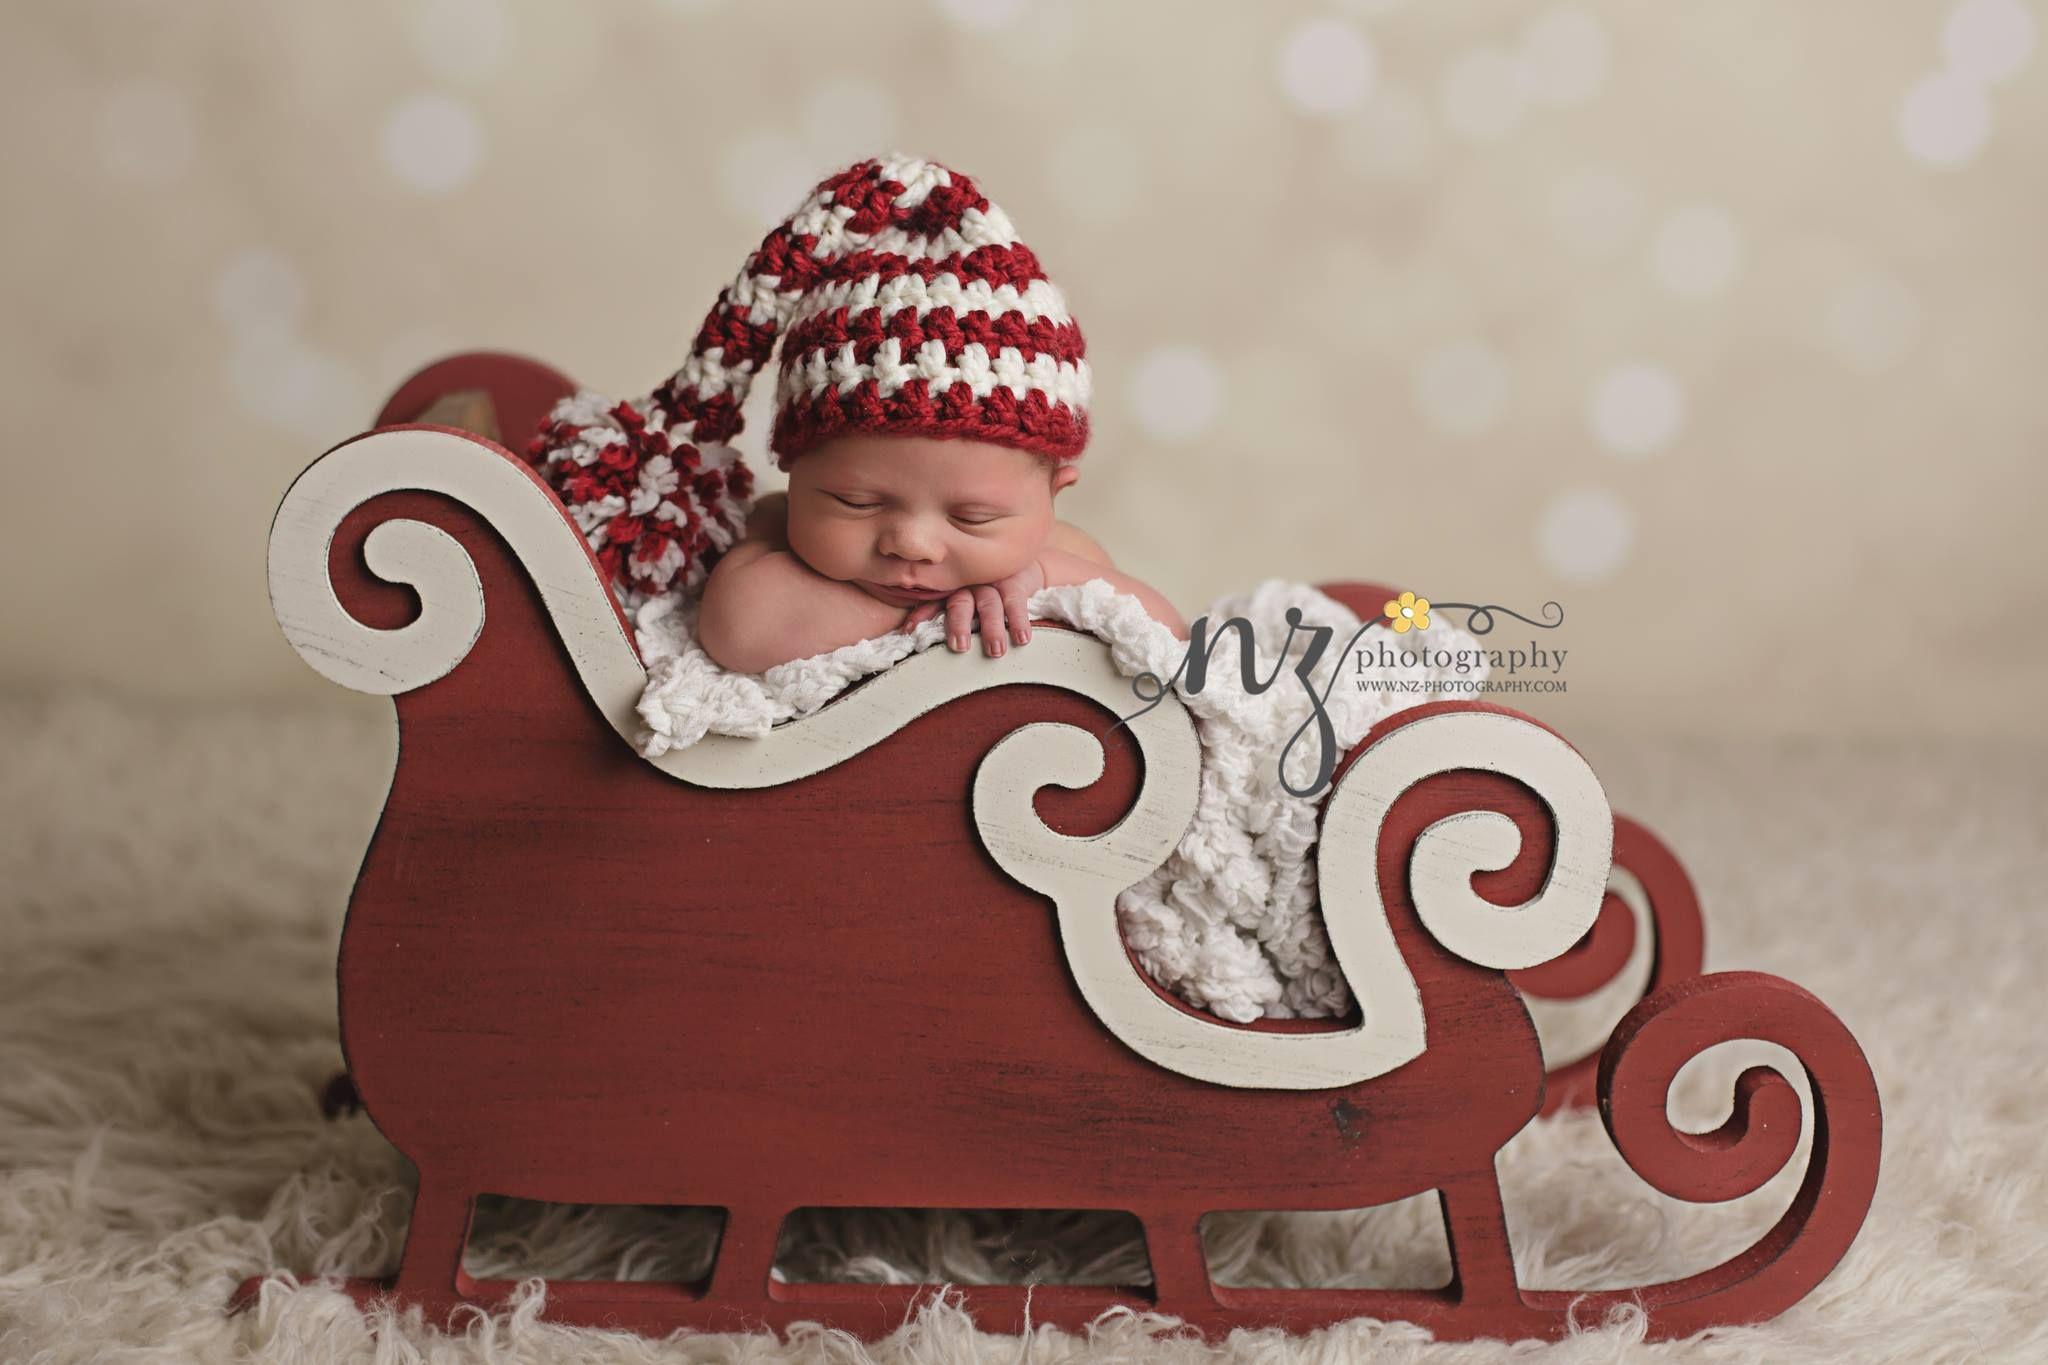 Sleigh prop newborn photography props